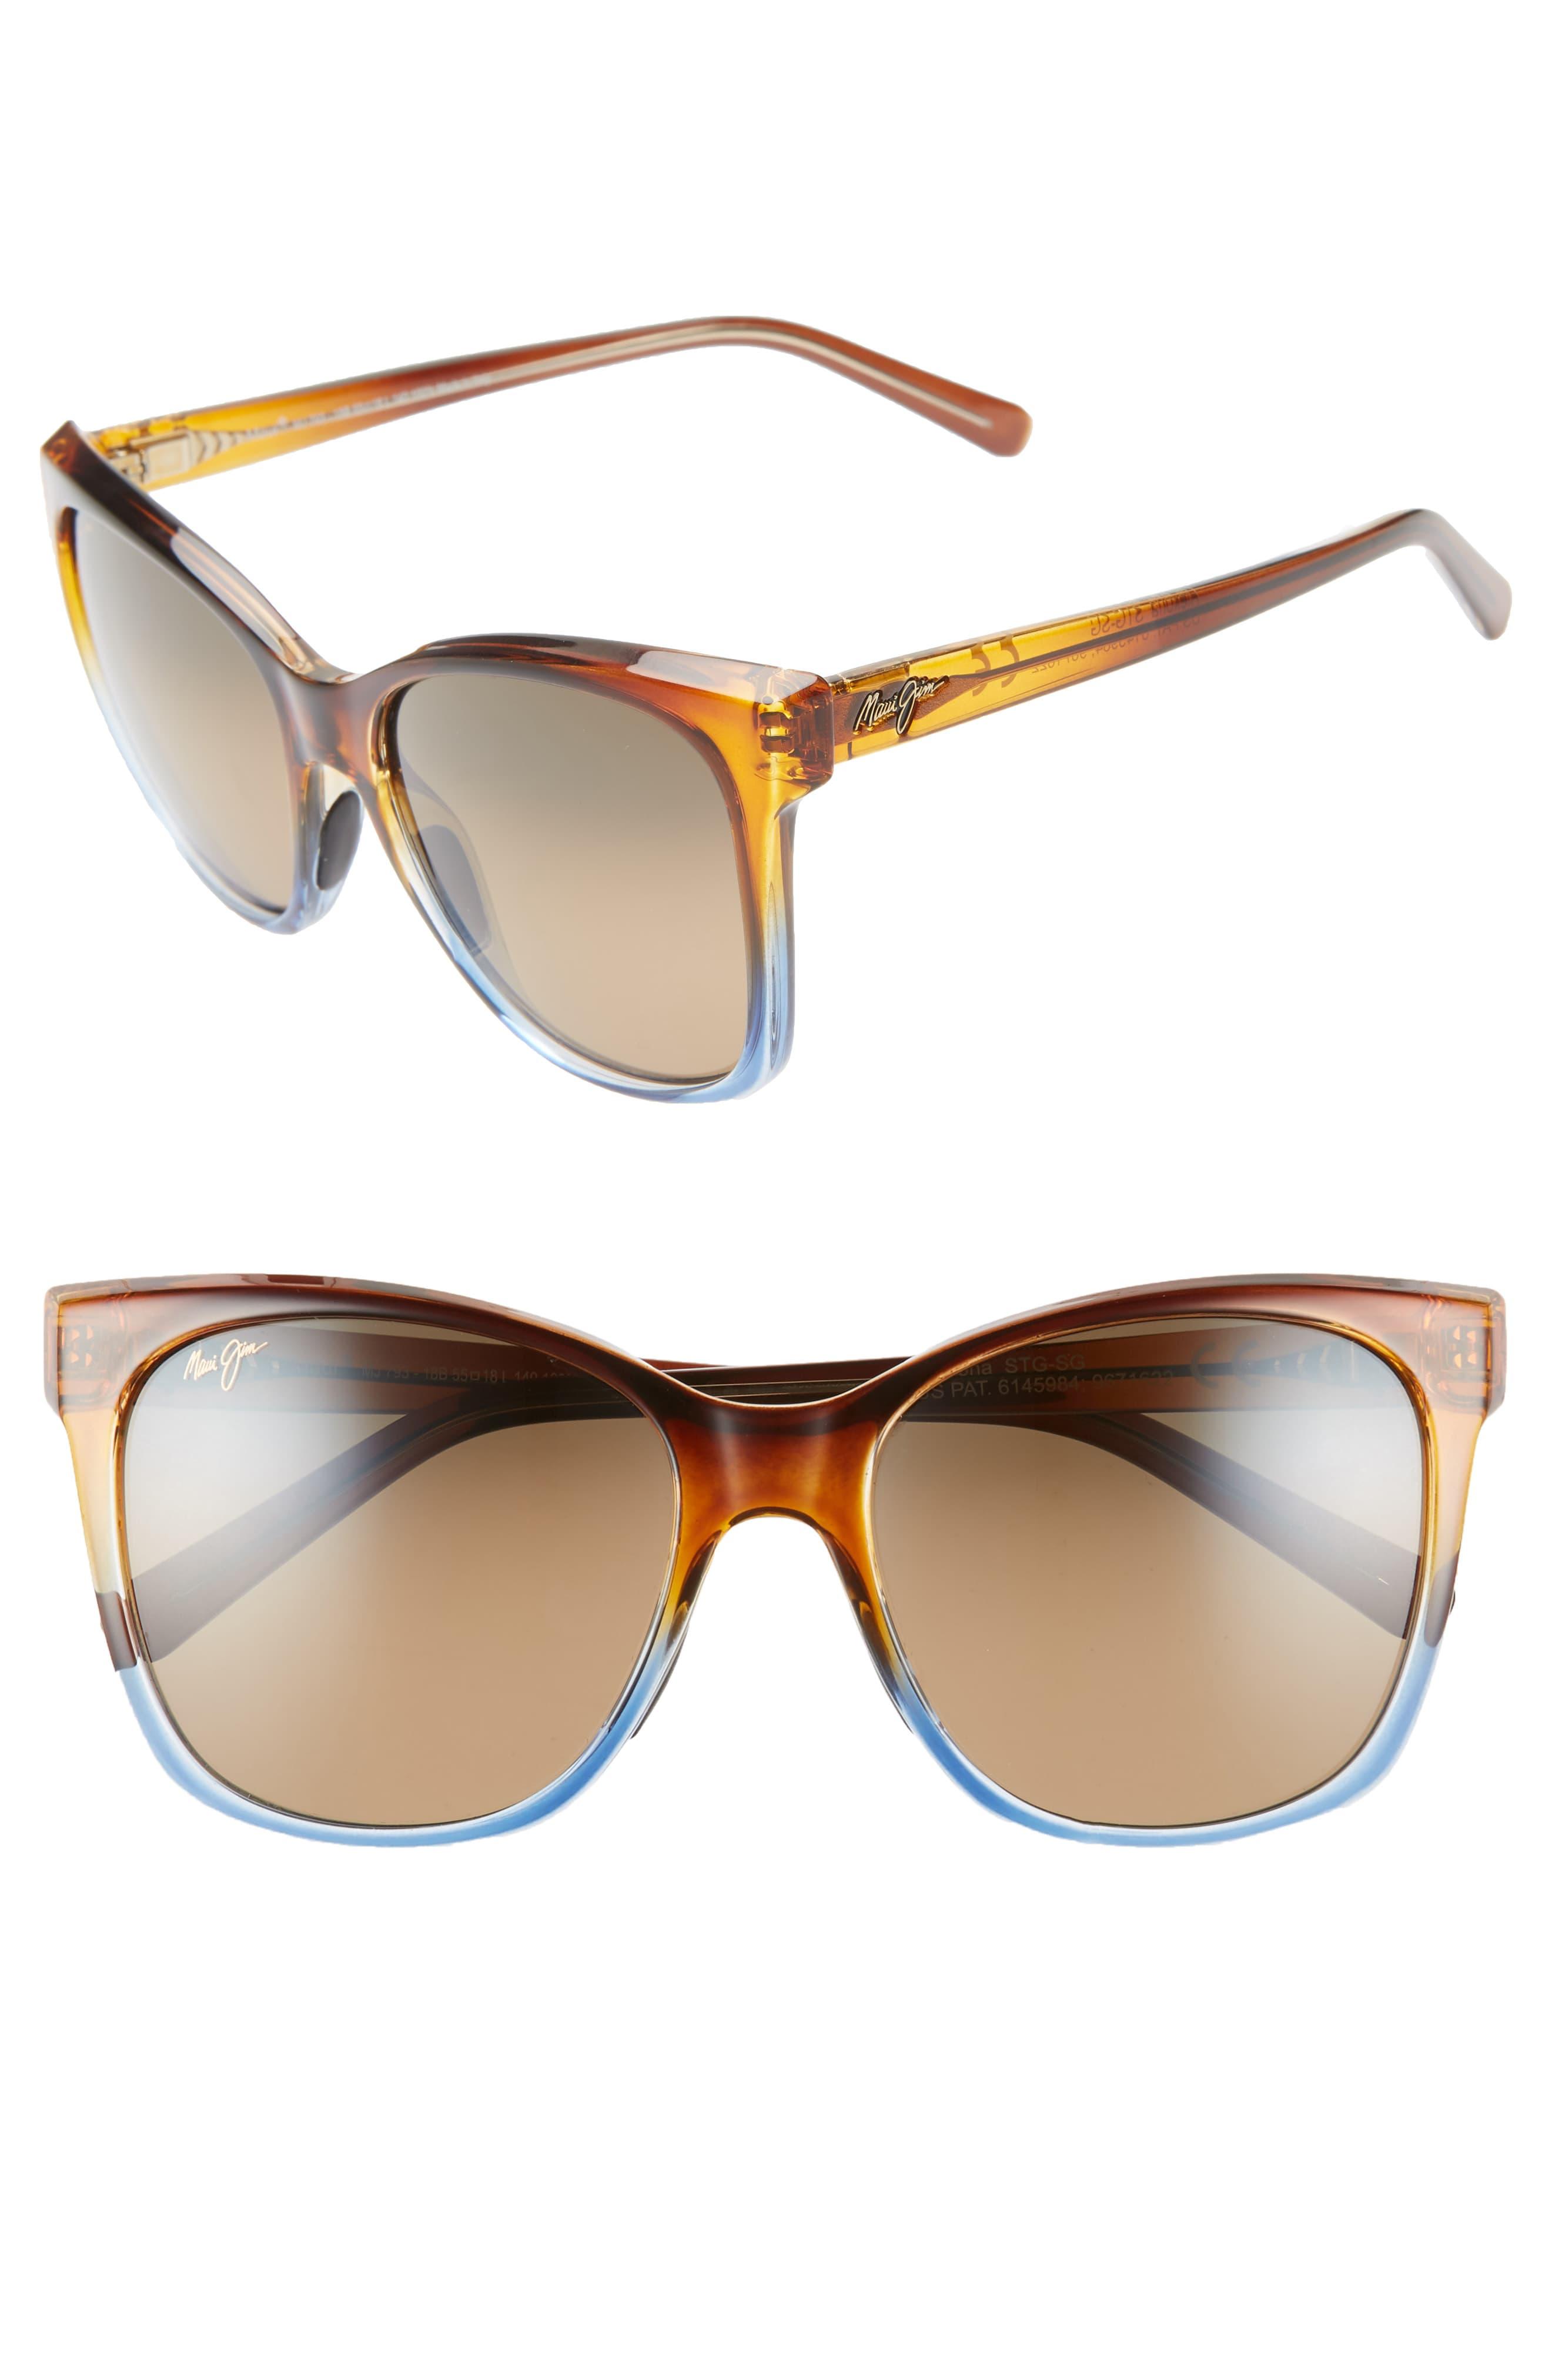 84eeeba94b Maui Jim Alekona 55Mm Sunglasses - Caramel With Blue/ Hcl Bronze in ...